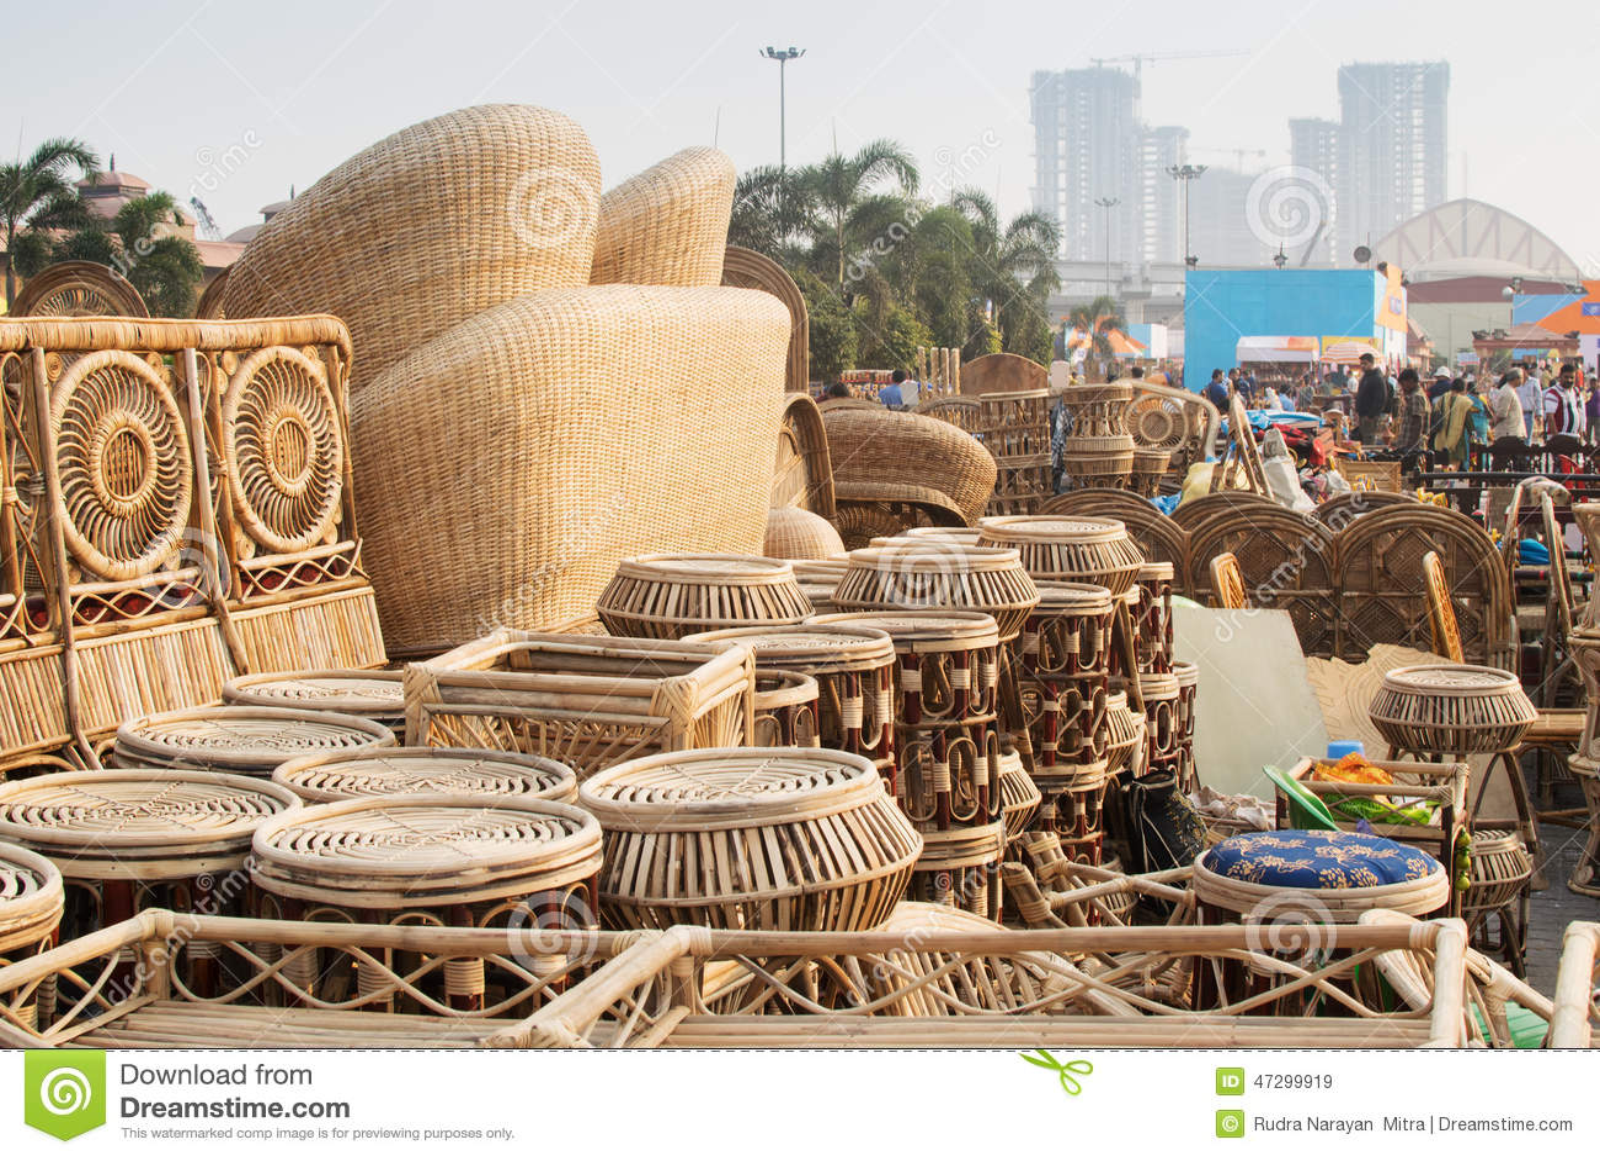 Cane Furnitures Indian Handicrafts Fair Kolkata Editorial Stock